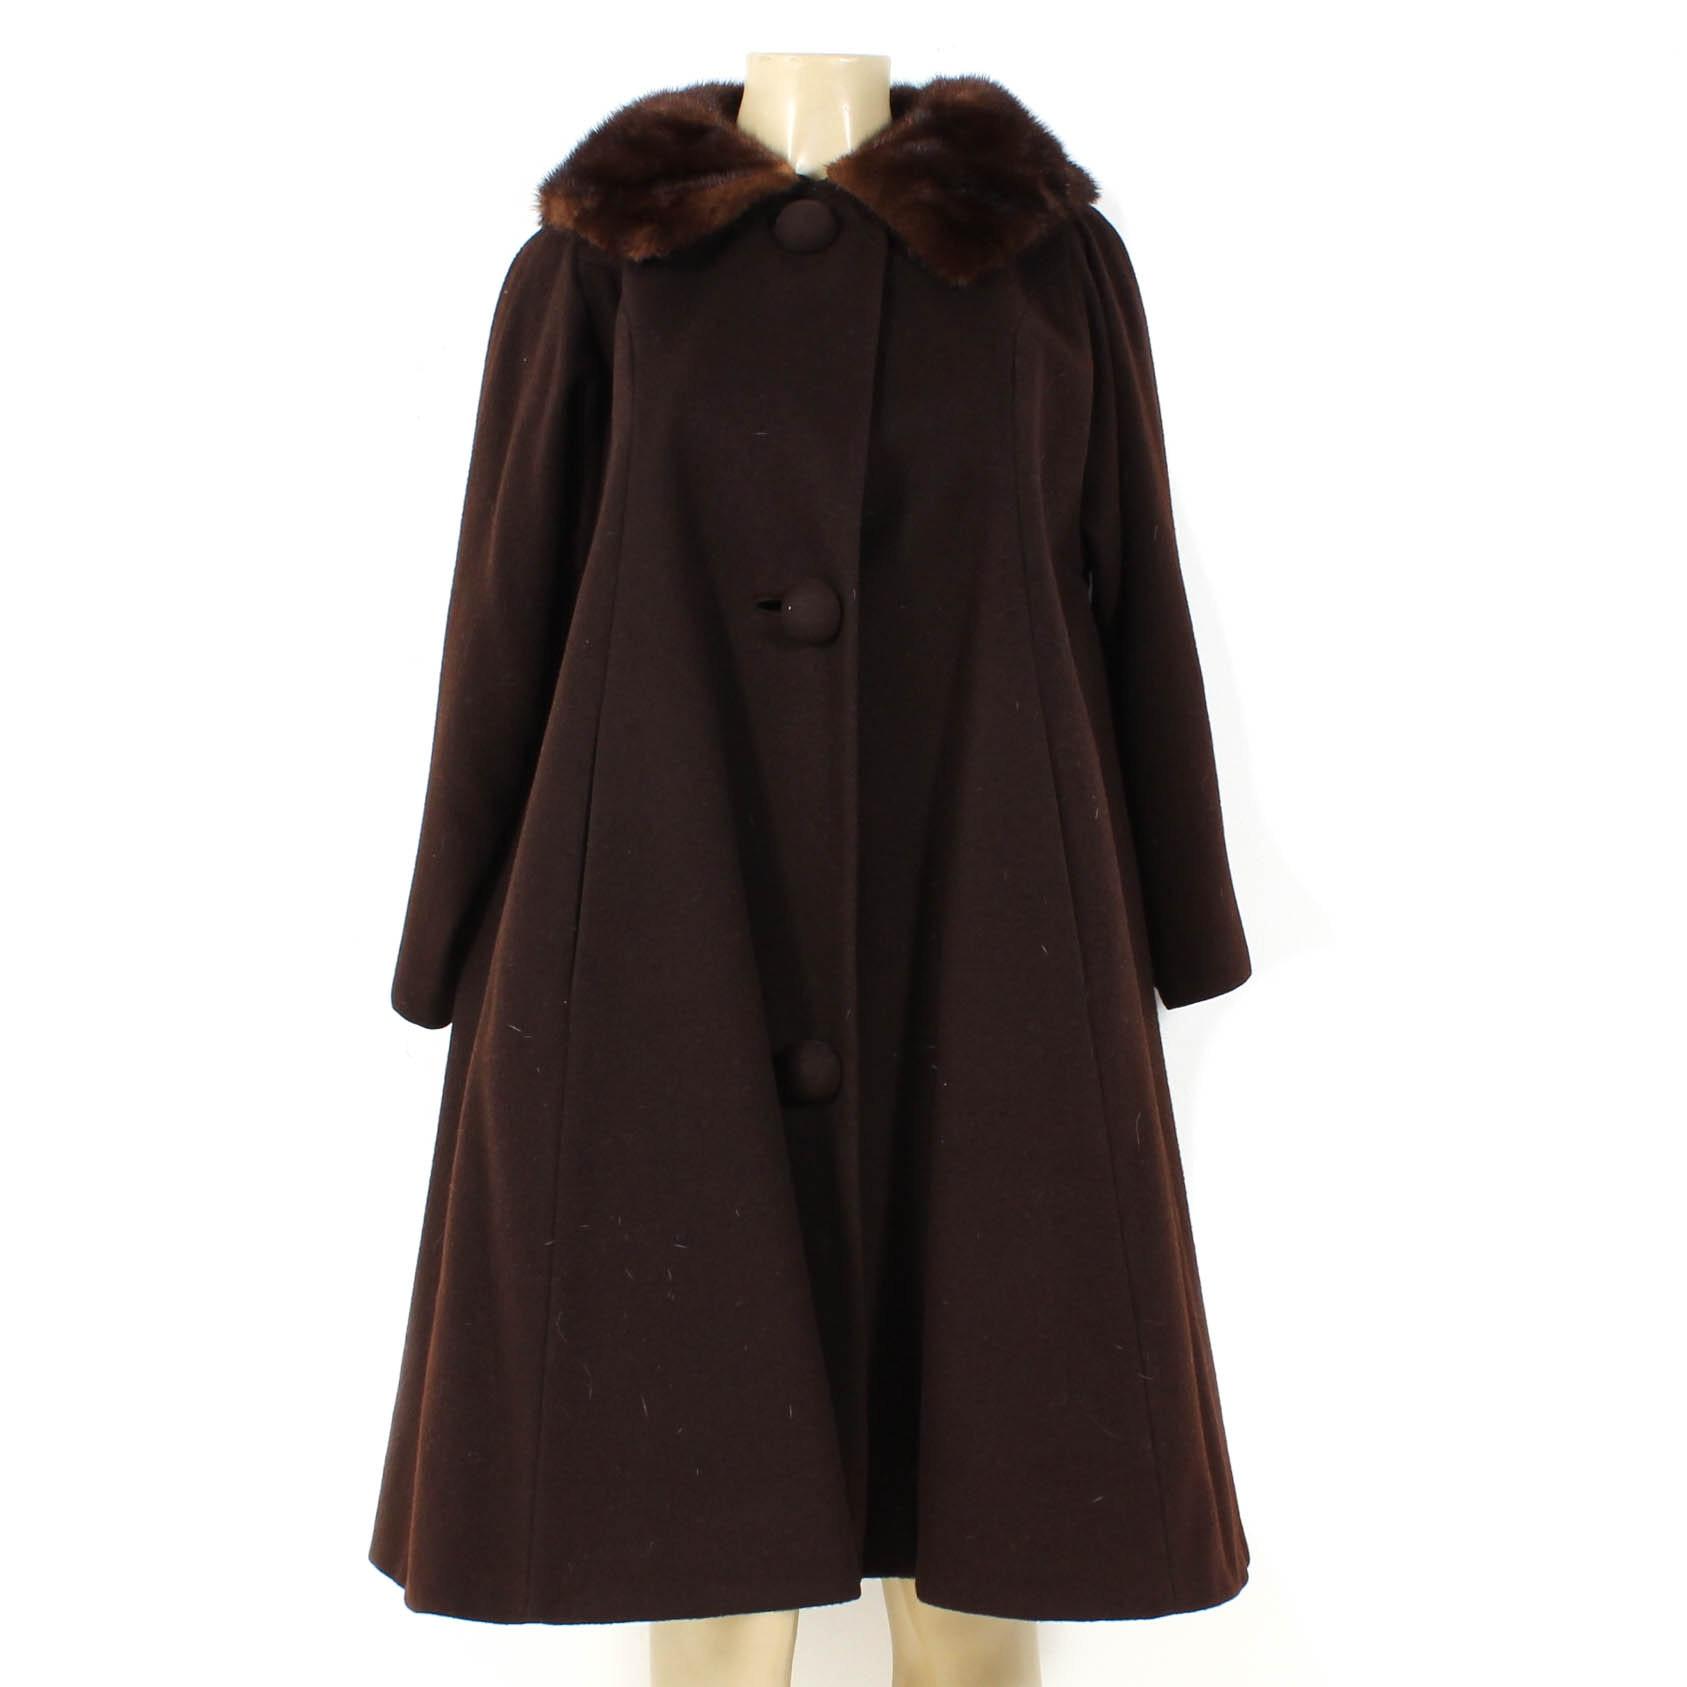 Vintage Brown Wool Swing Coat with Mahogany Mink Fur Collar